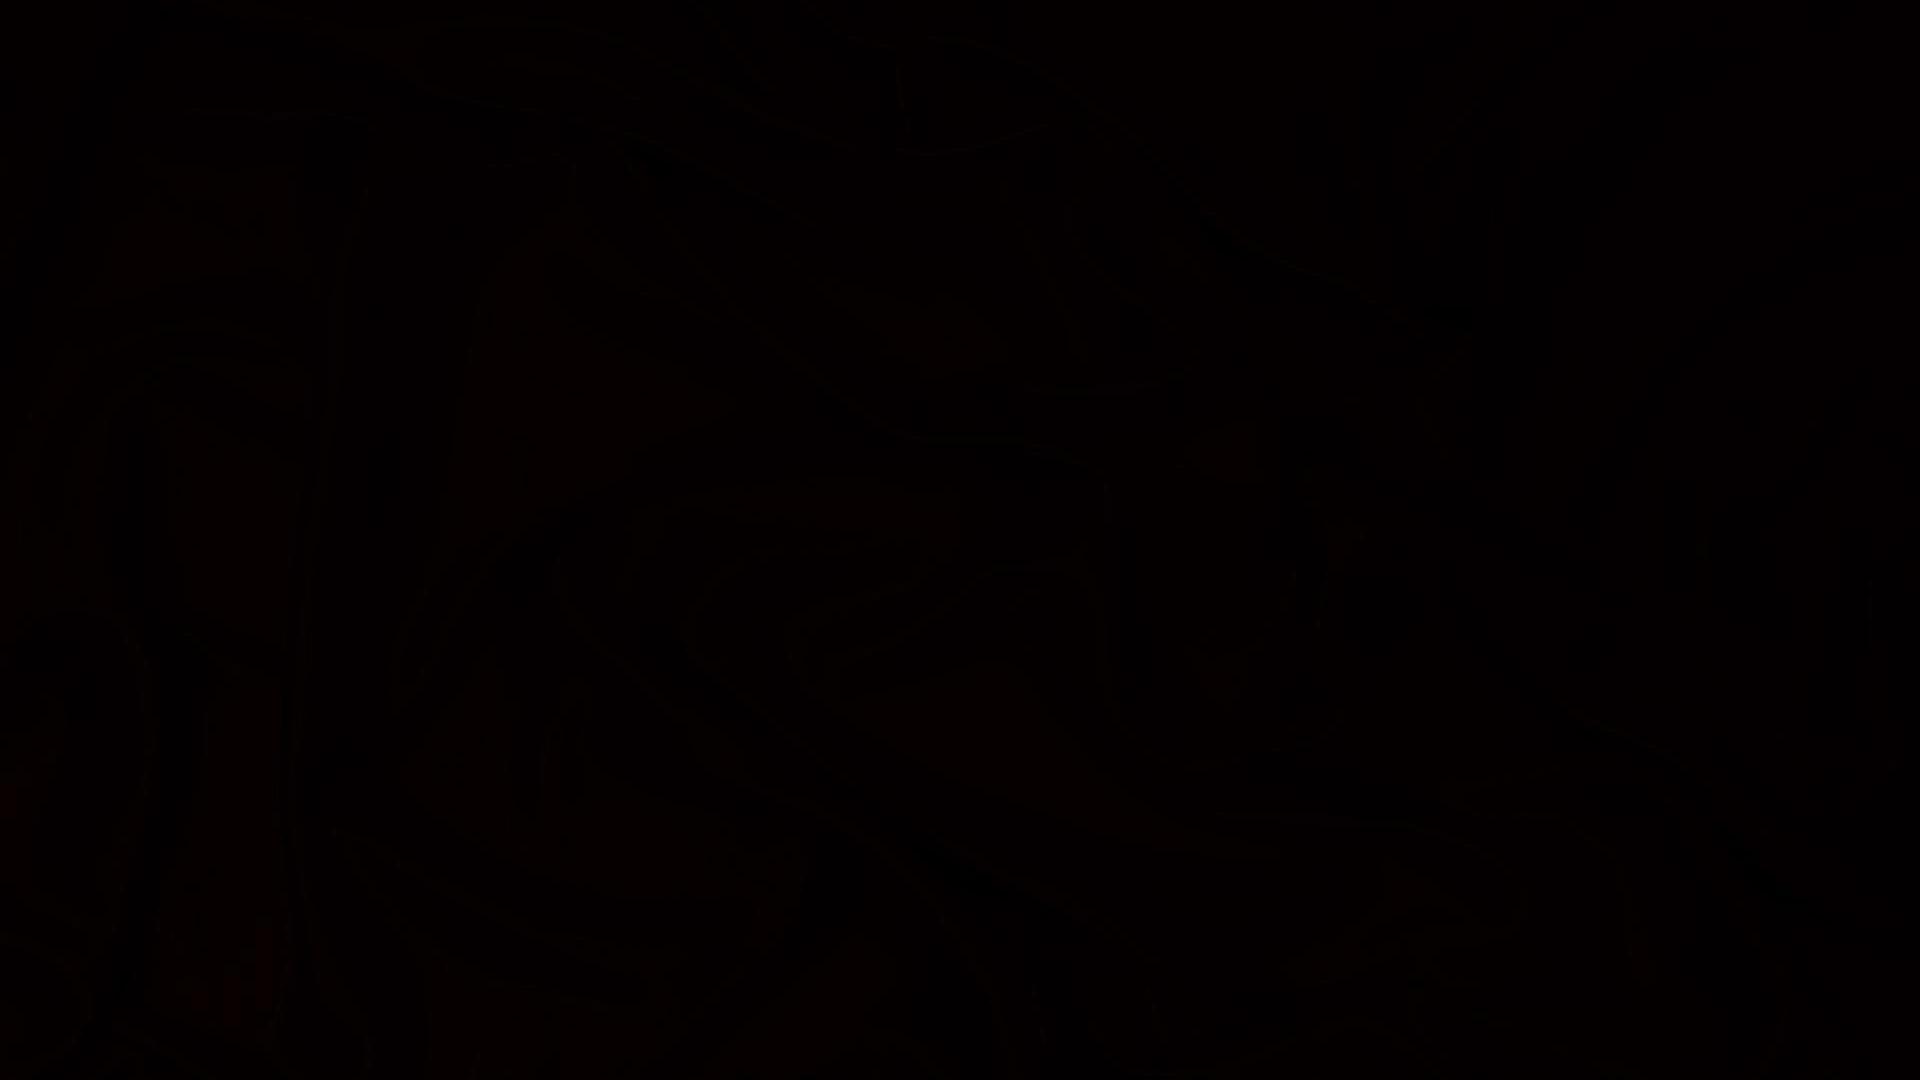 black-wallpaper-1.jpg